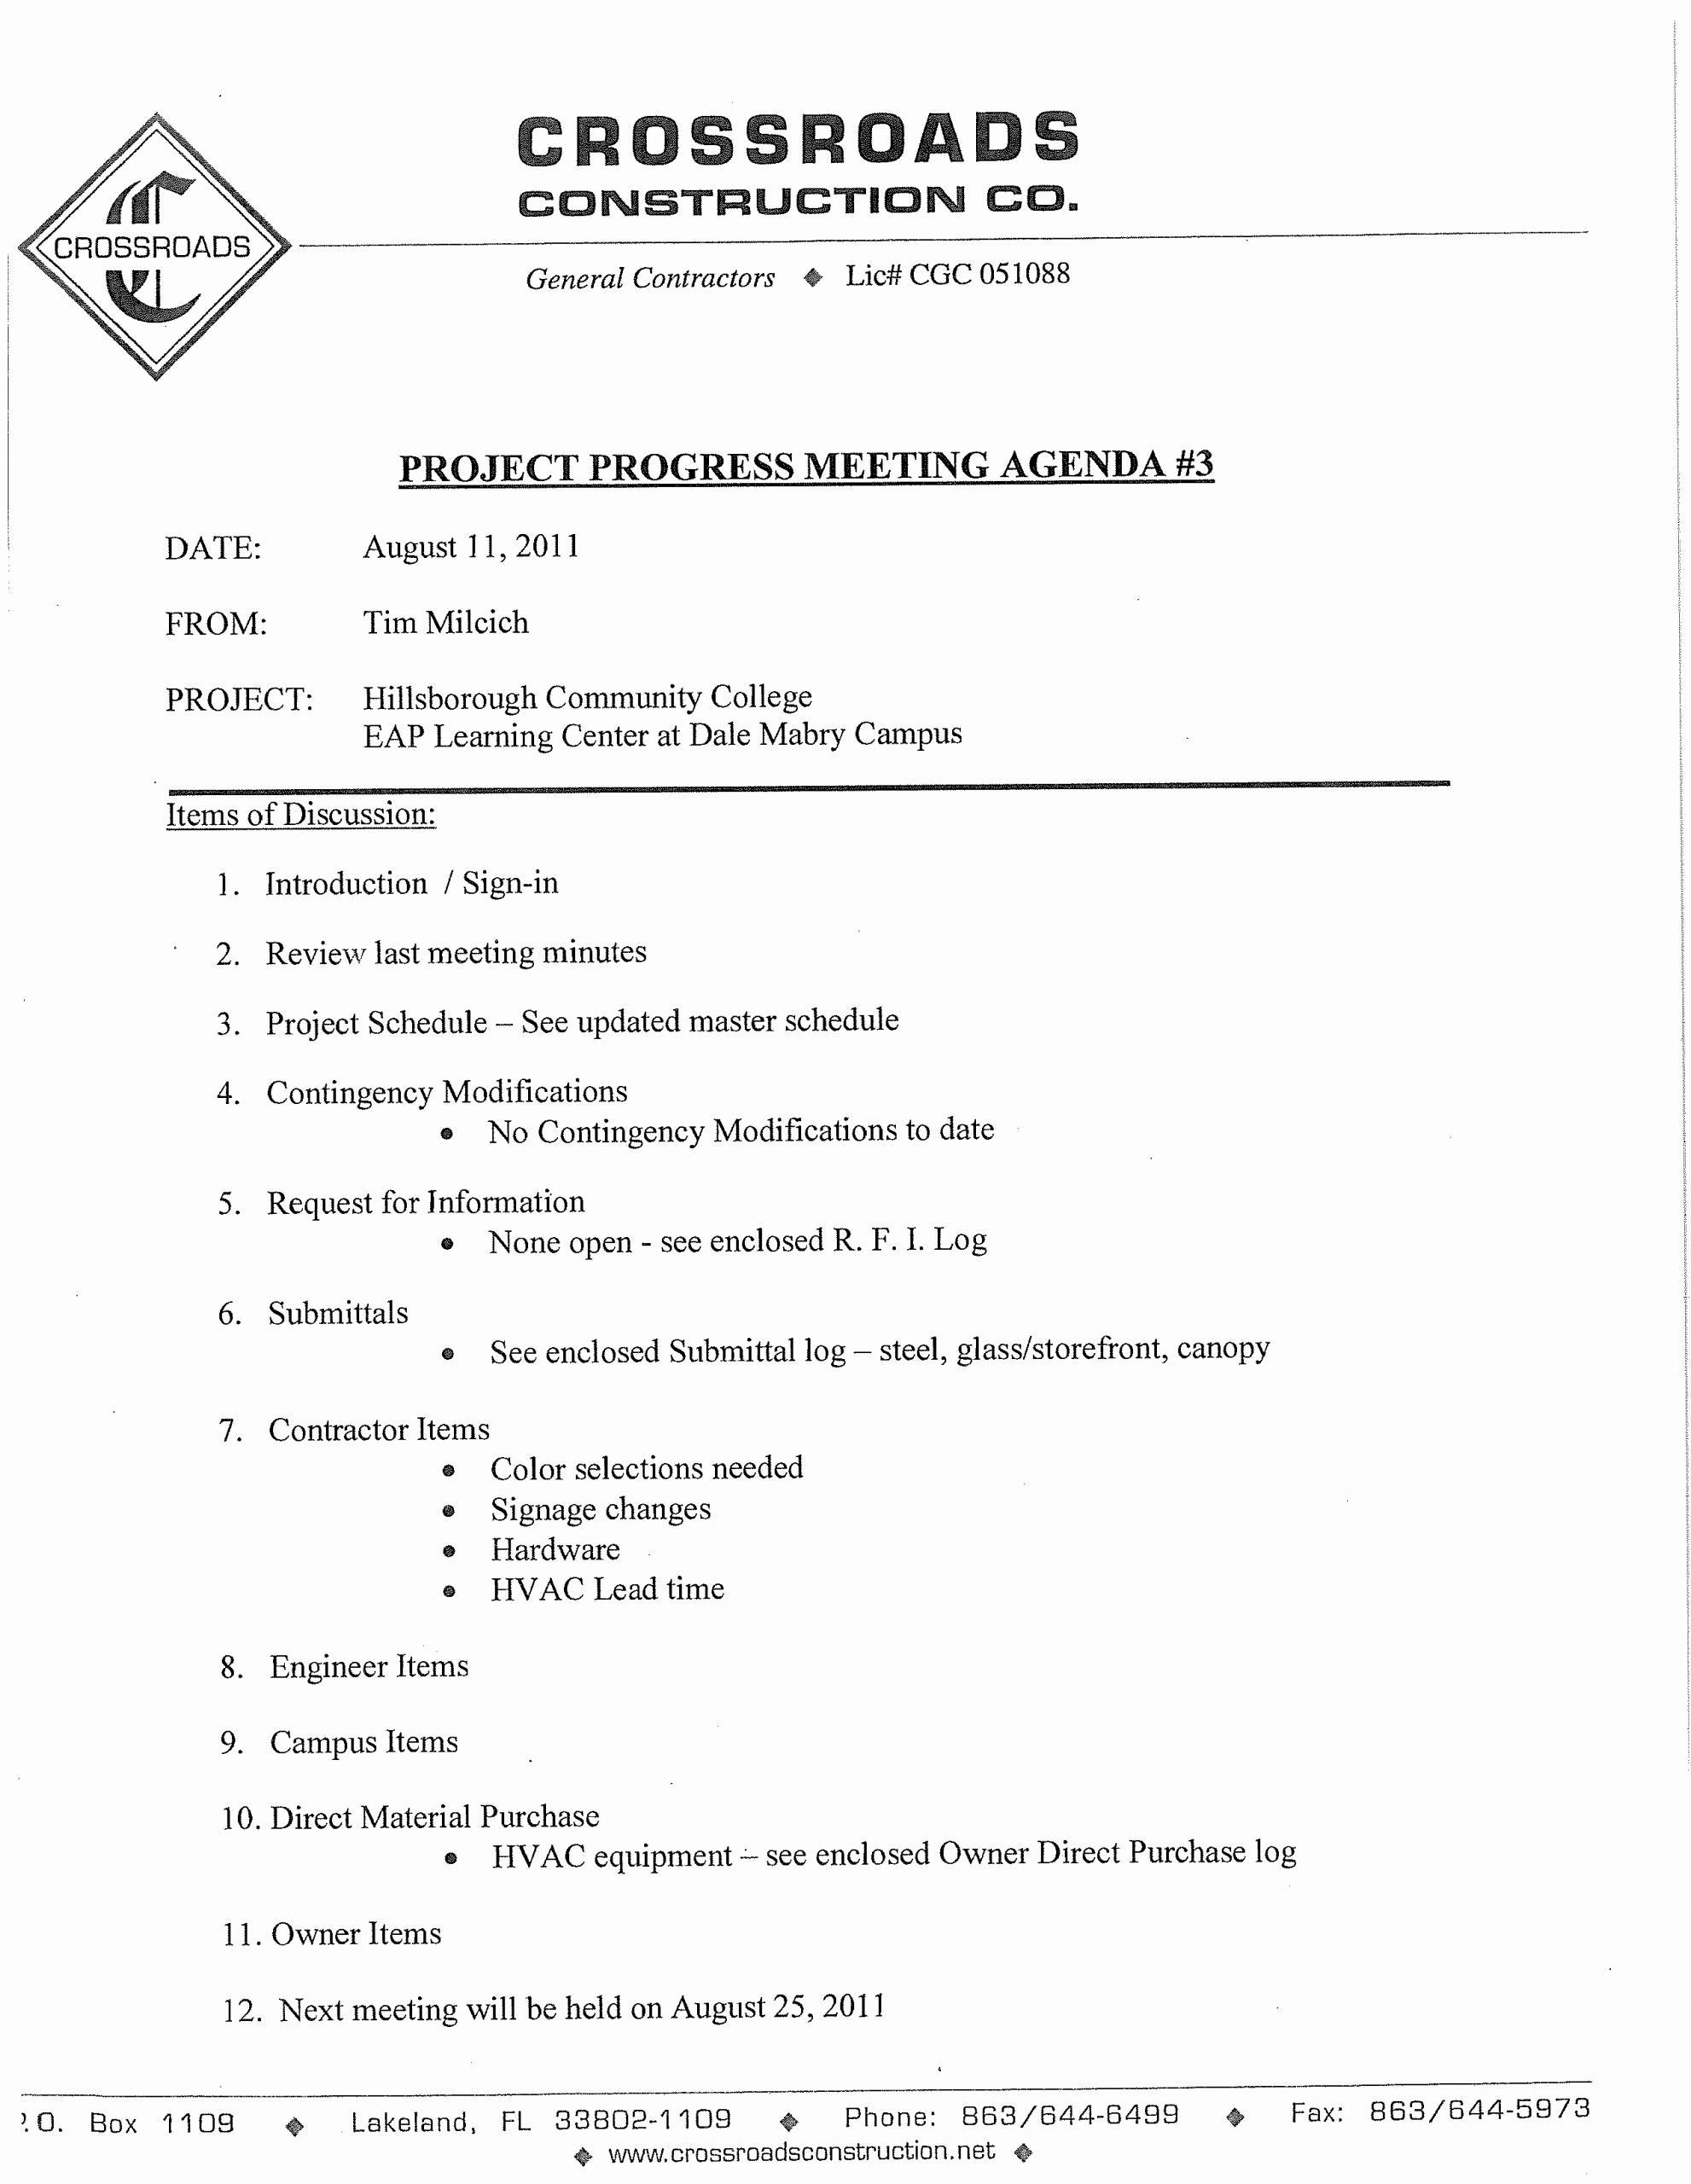 Pre Construction Meeting Agenda Template Luxury 免费 Construction Project Progress Meeting Agenda Template